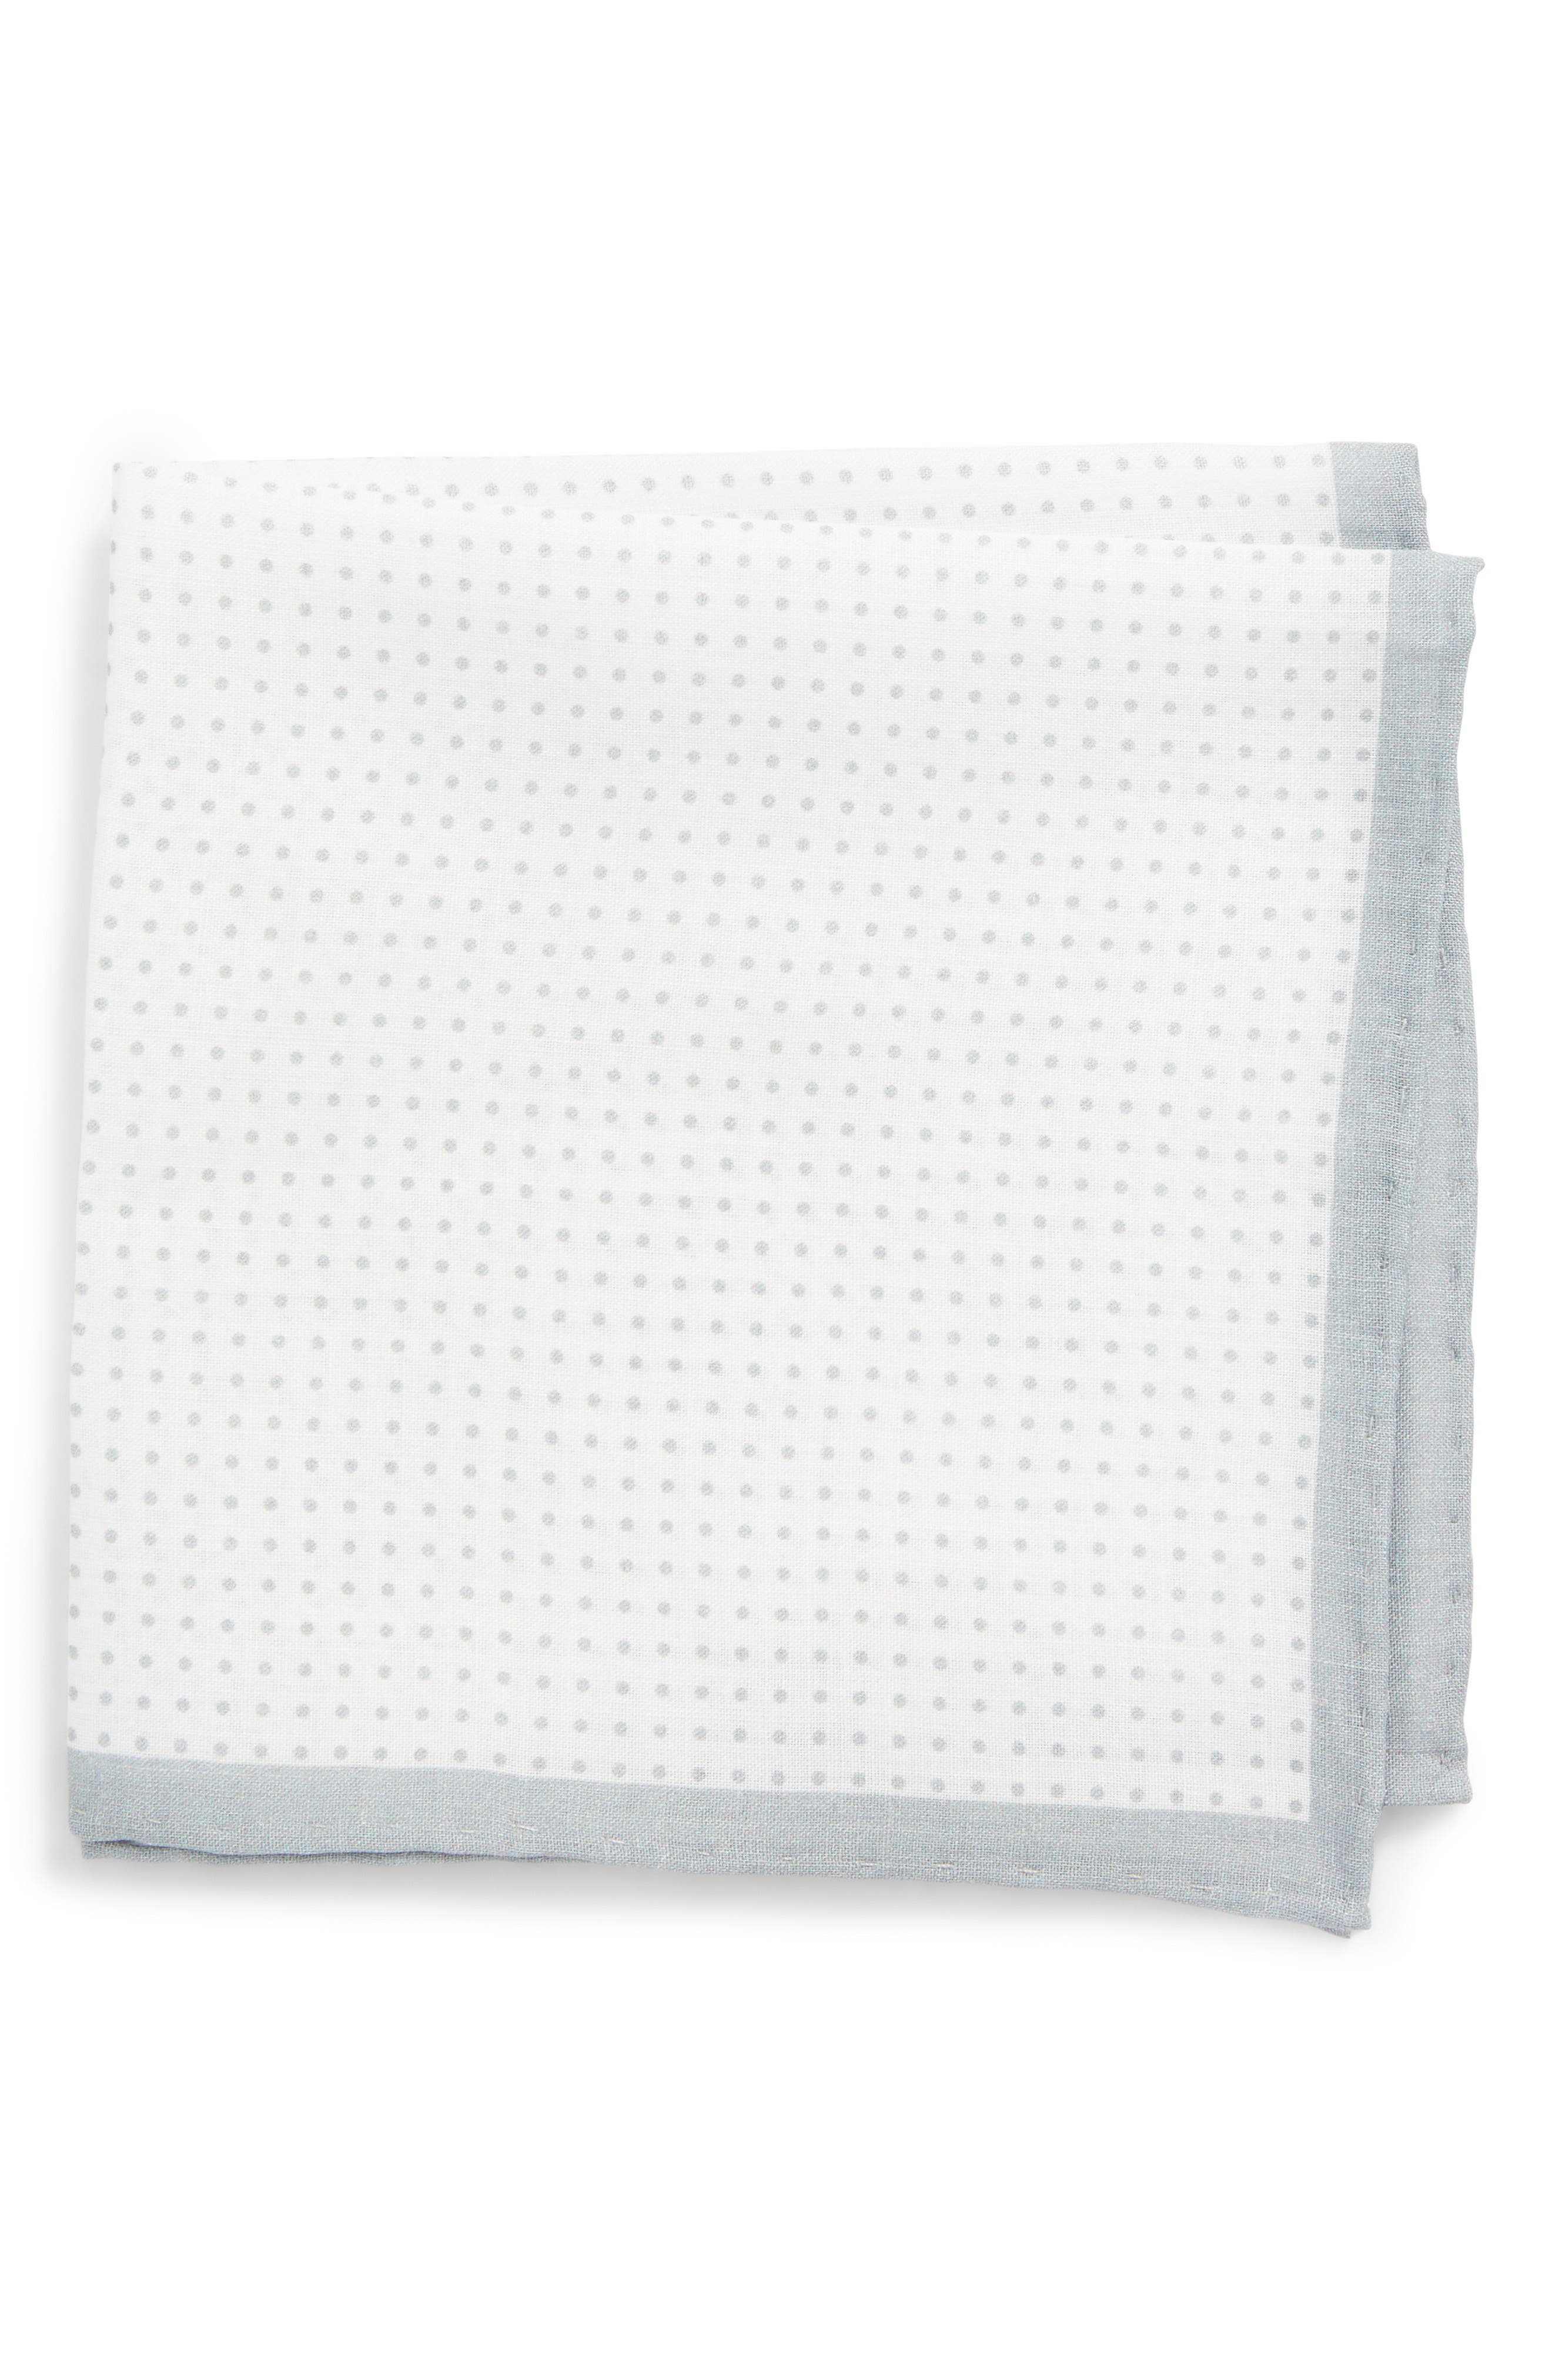 Main Image - The Tie Bar Domino Dot Linen Pocket Square